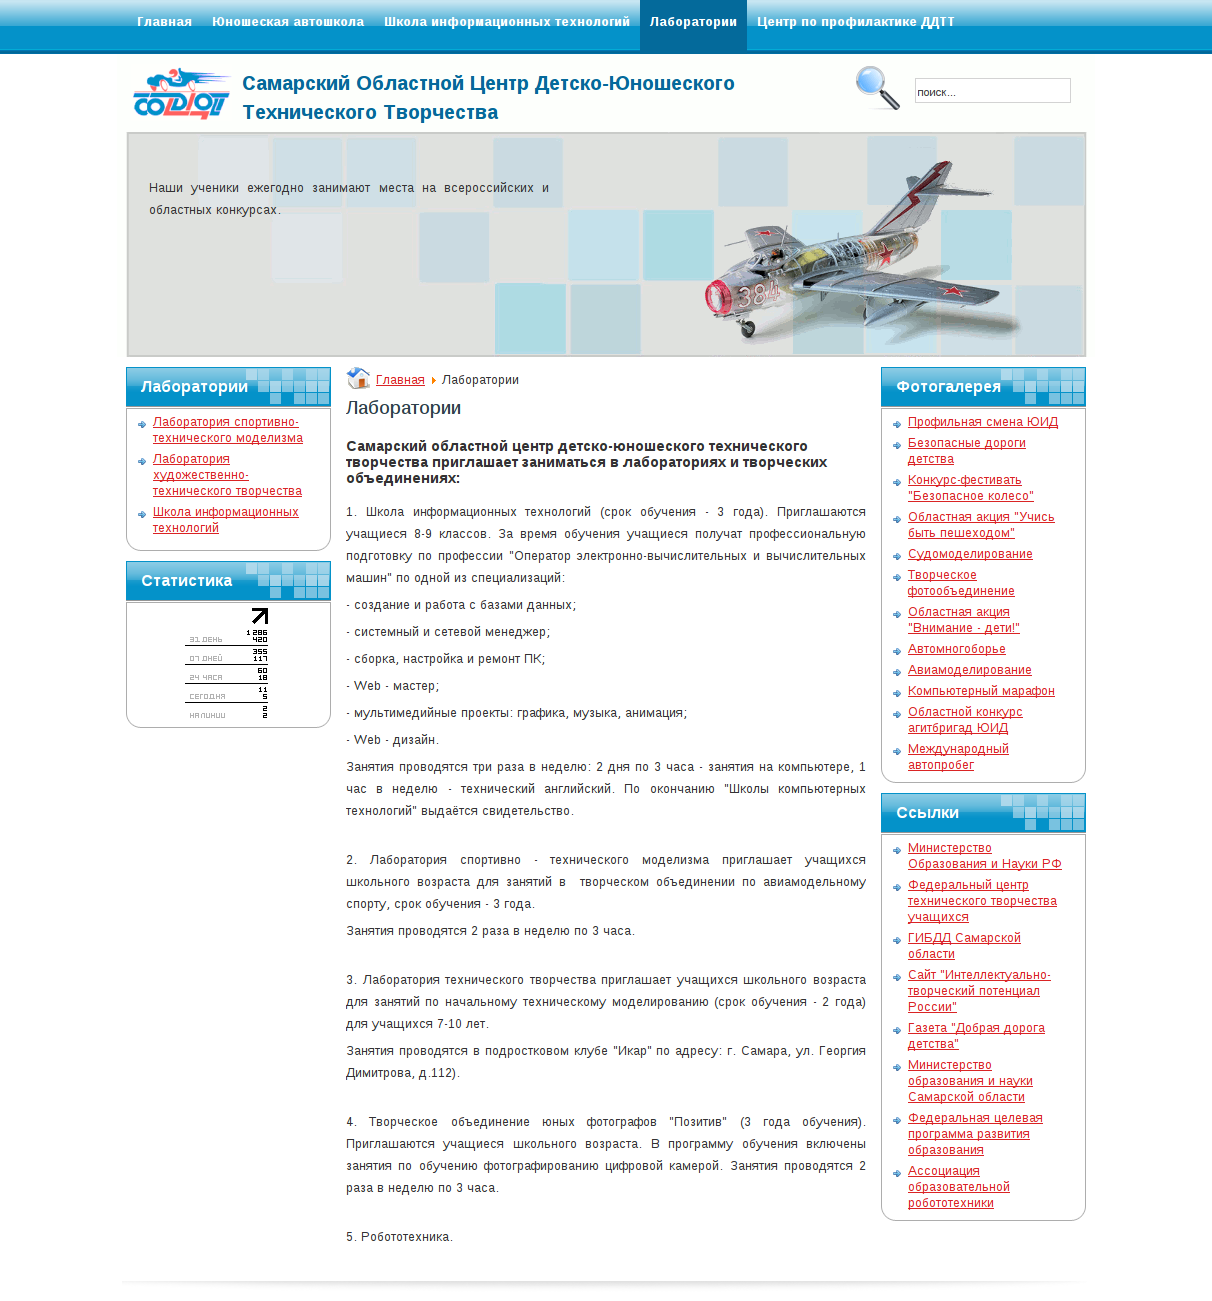 Сайт Центра детско-юношеского творчества на Joomla.